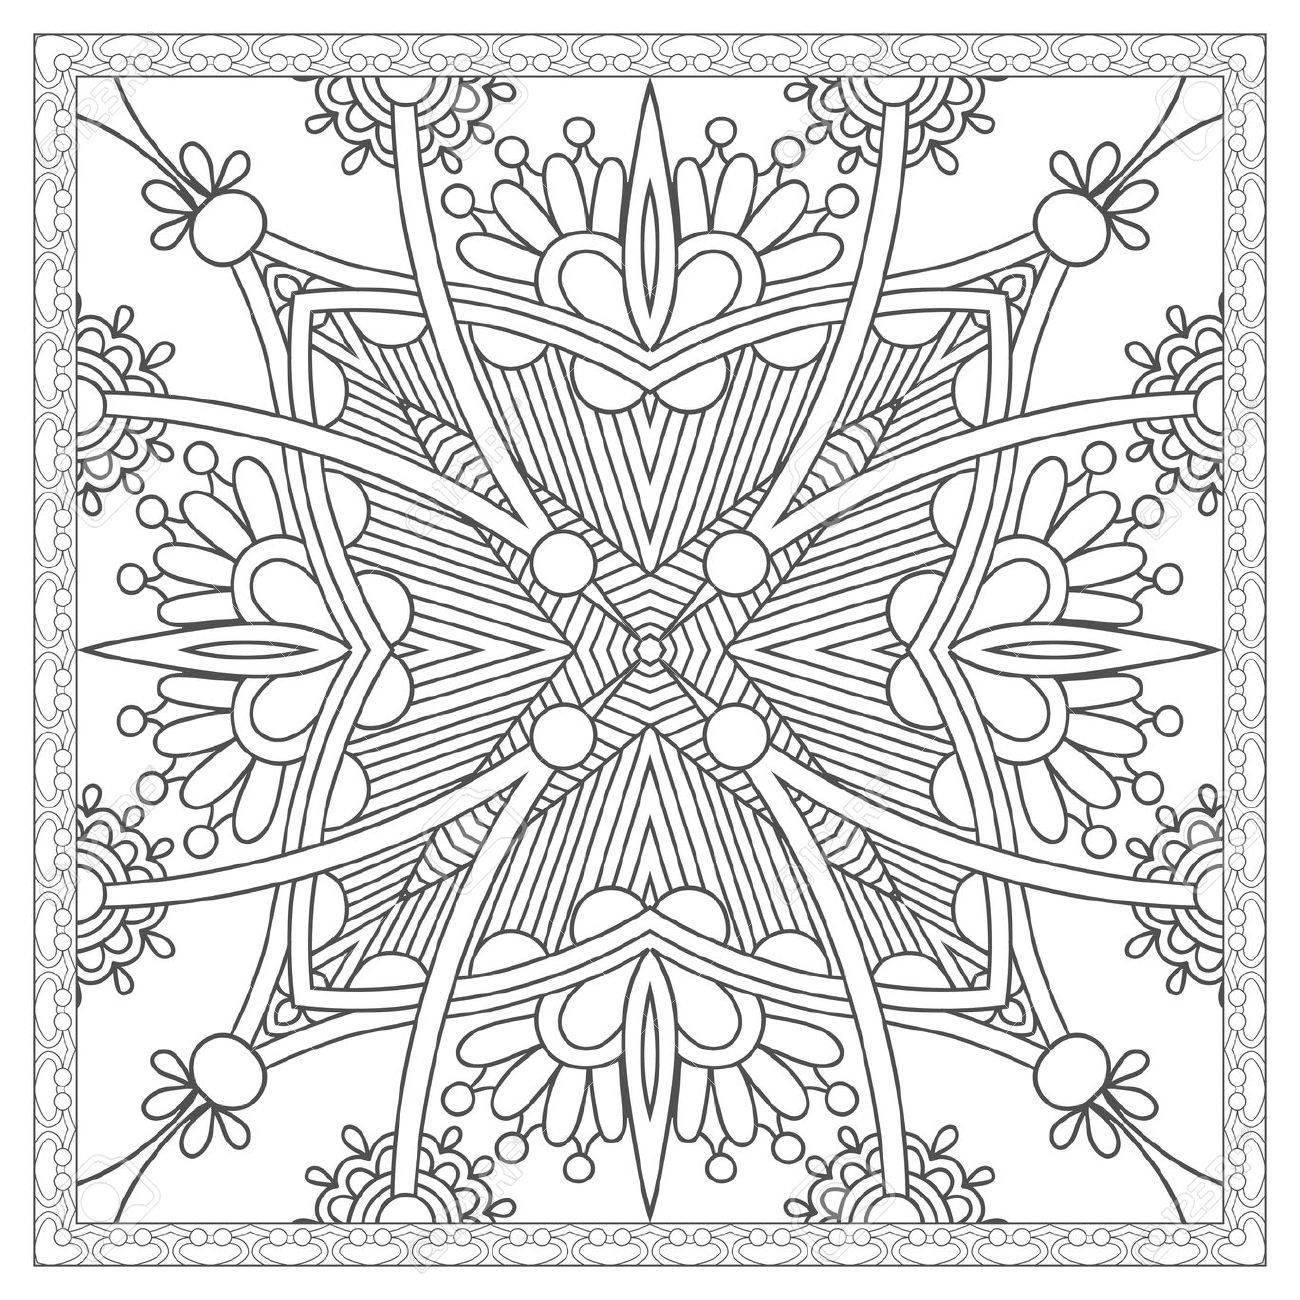 Unique Coloring Book Square Page For Adults - Ethnic Floral Carpet ...